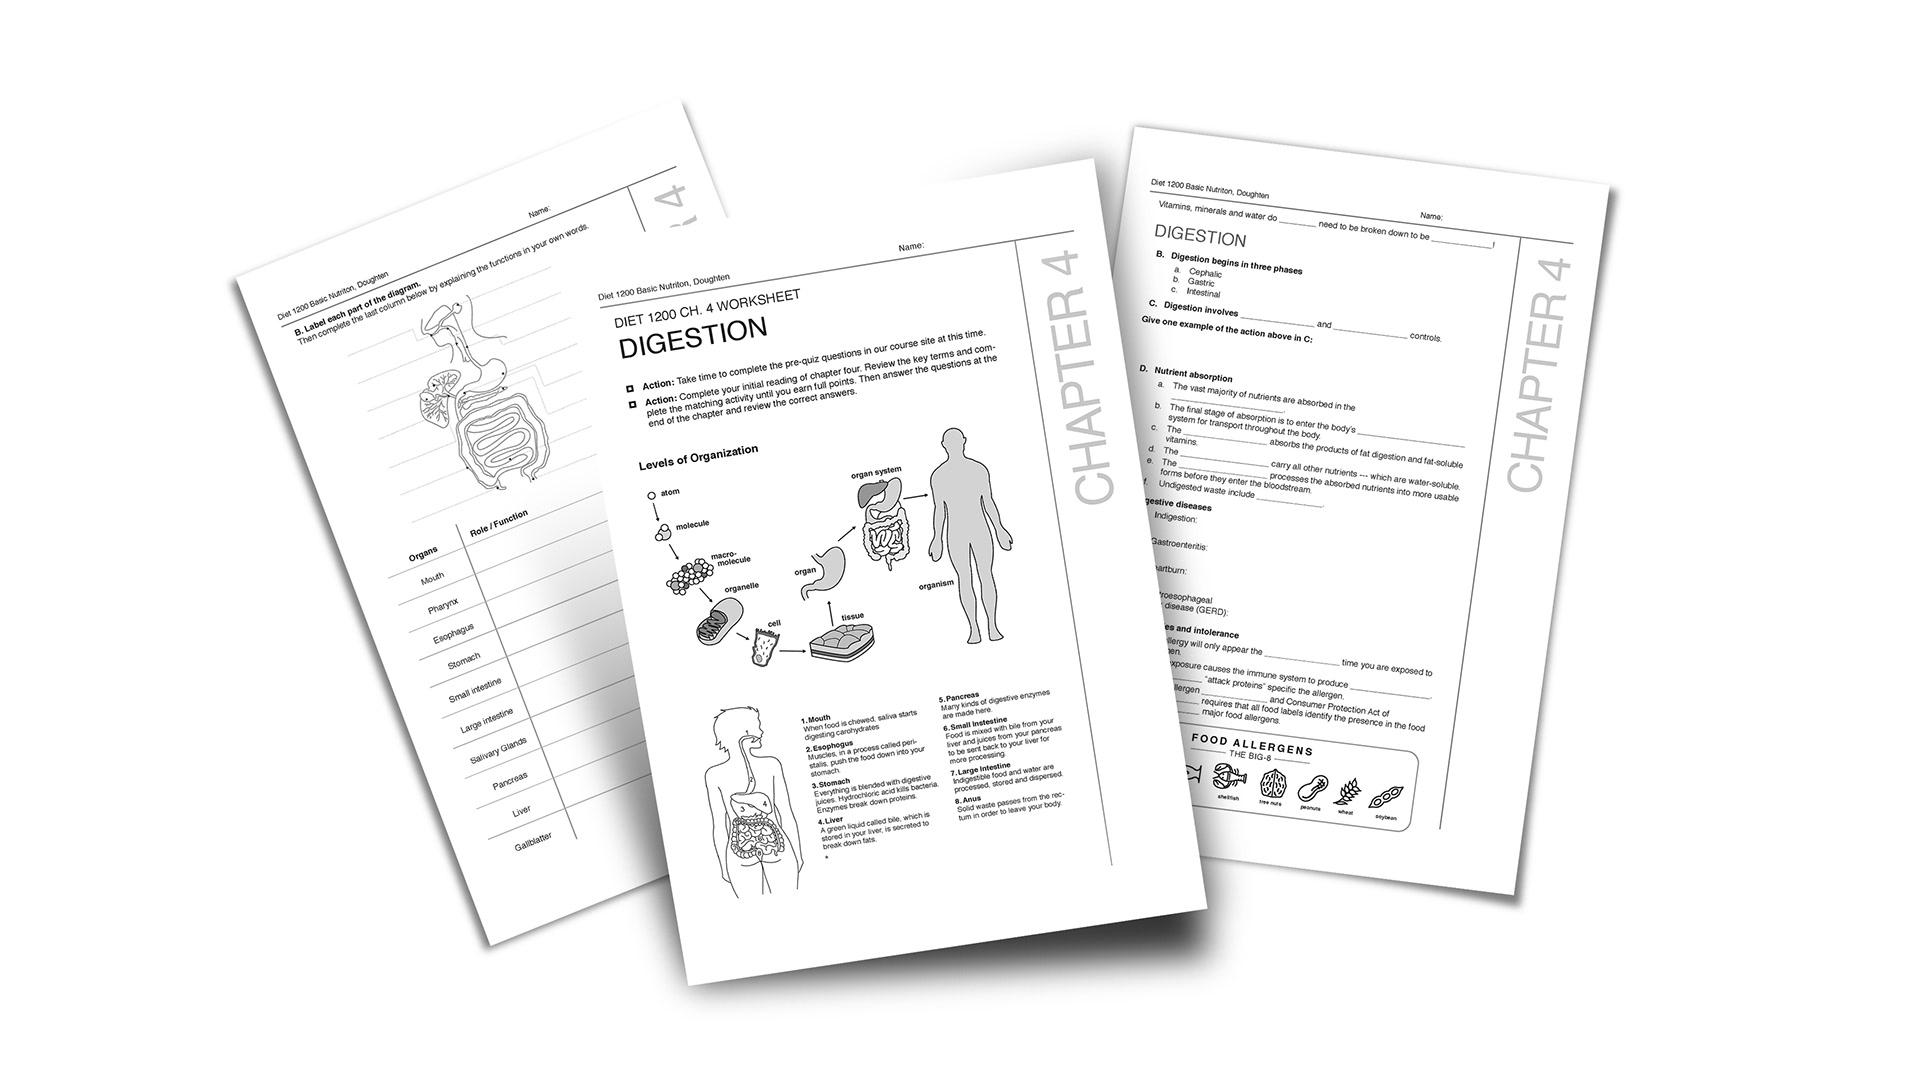 Chloe Burton Design - Information Design